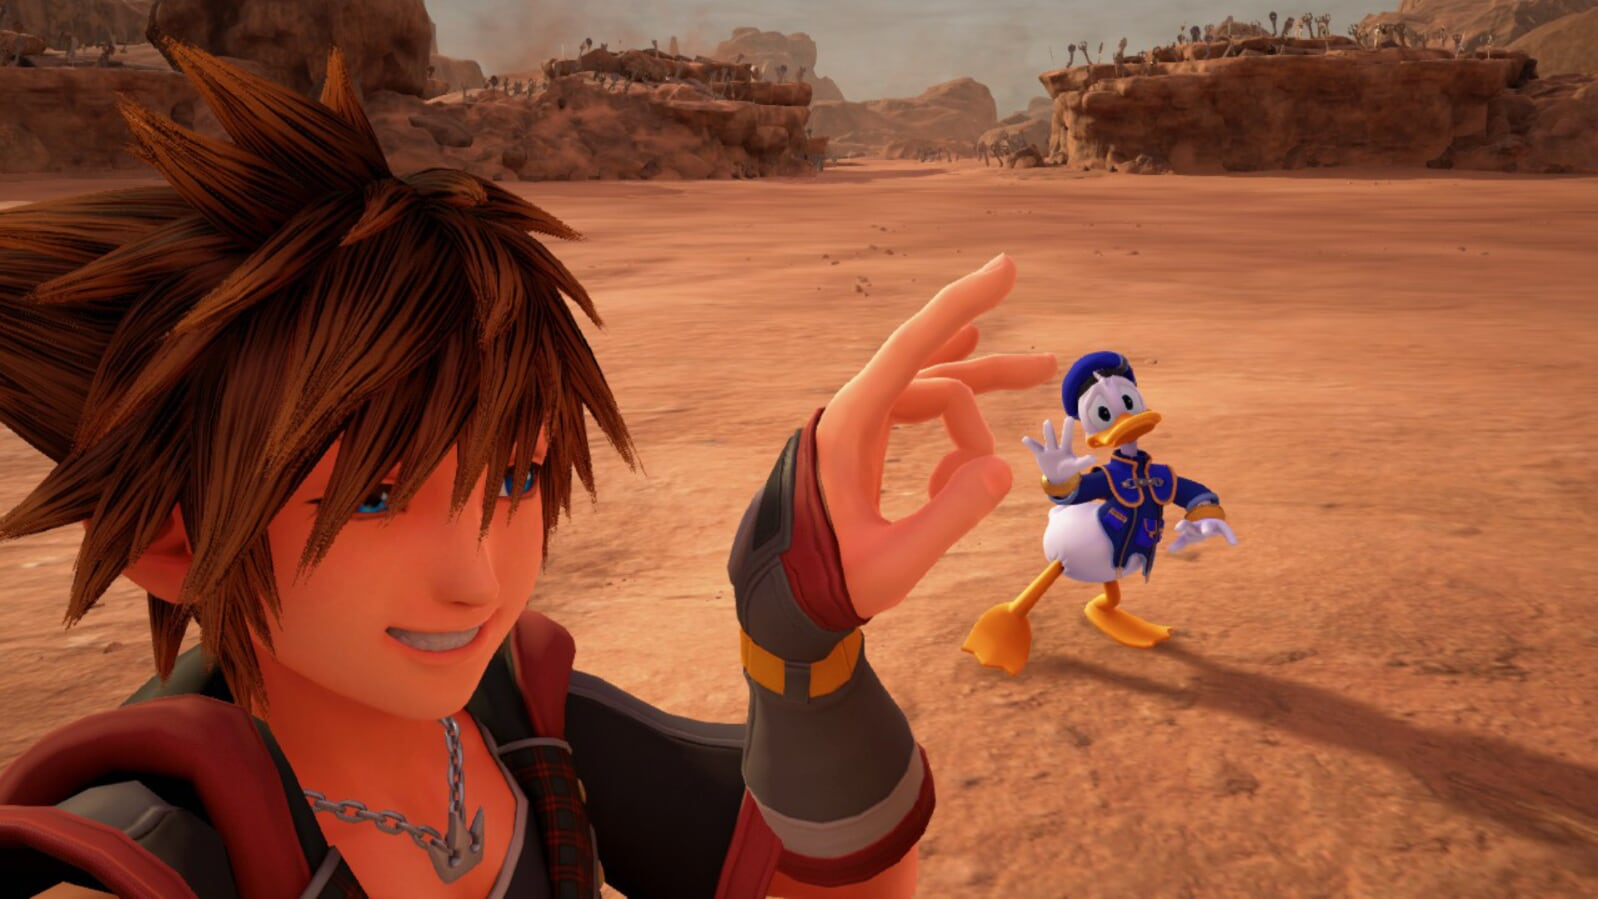 Kingdom Hearts III gets a little bit tougher tomorrow